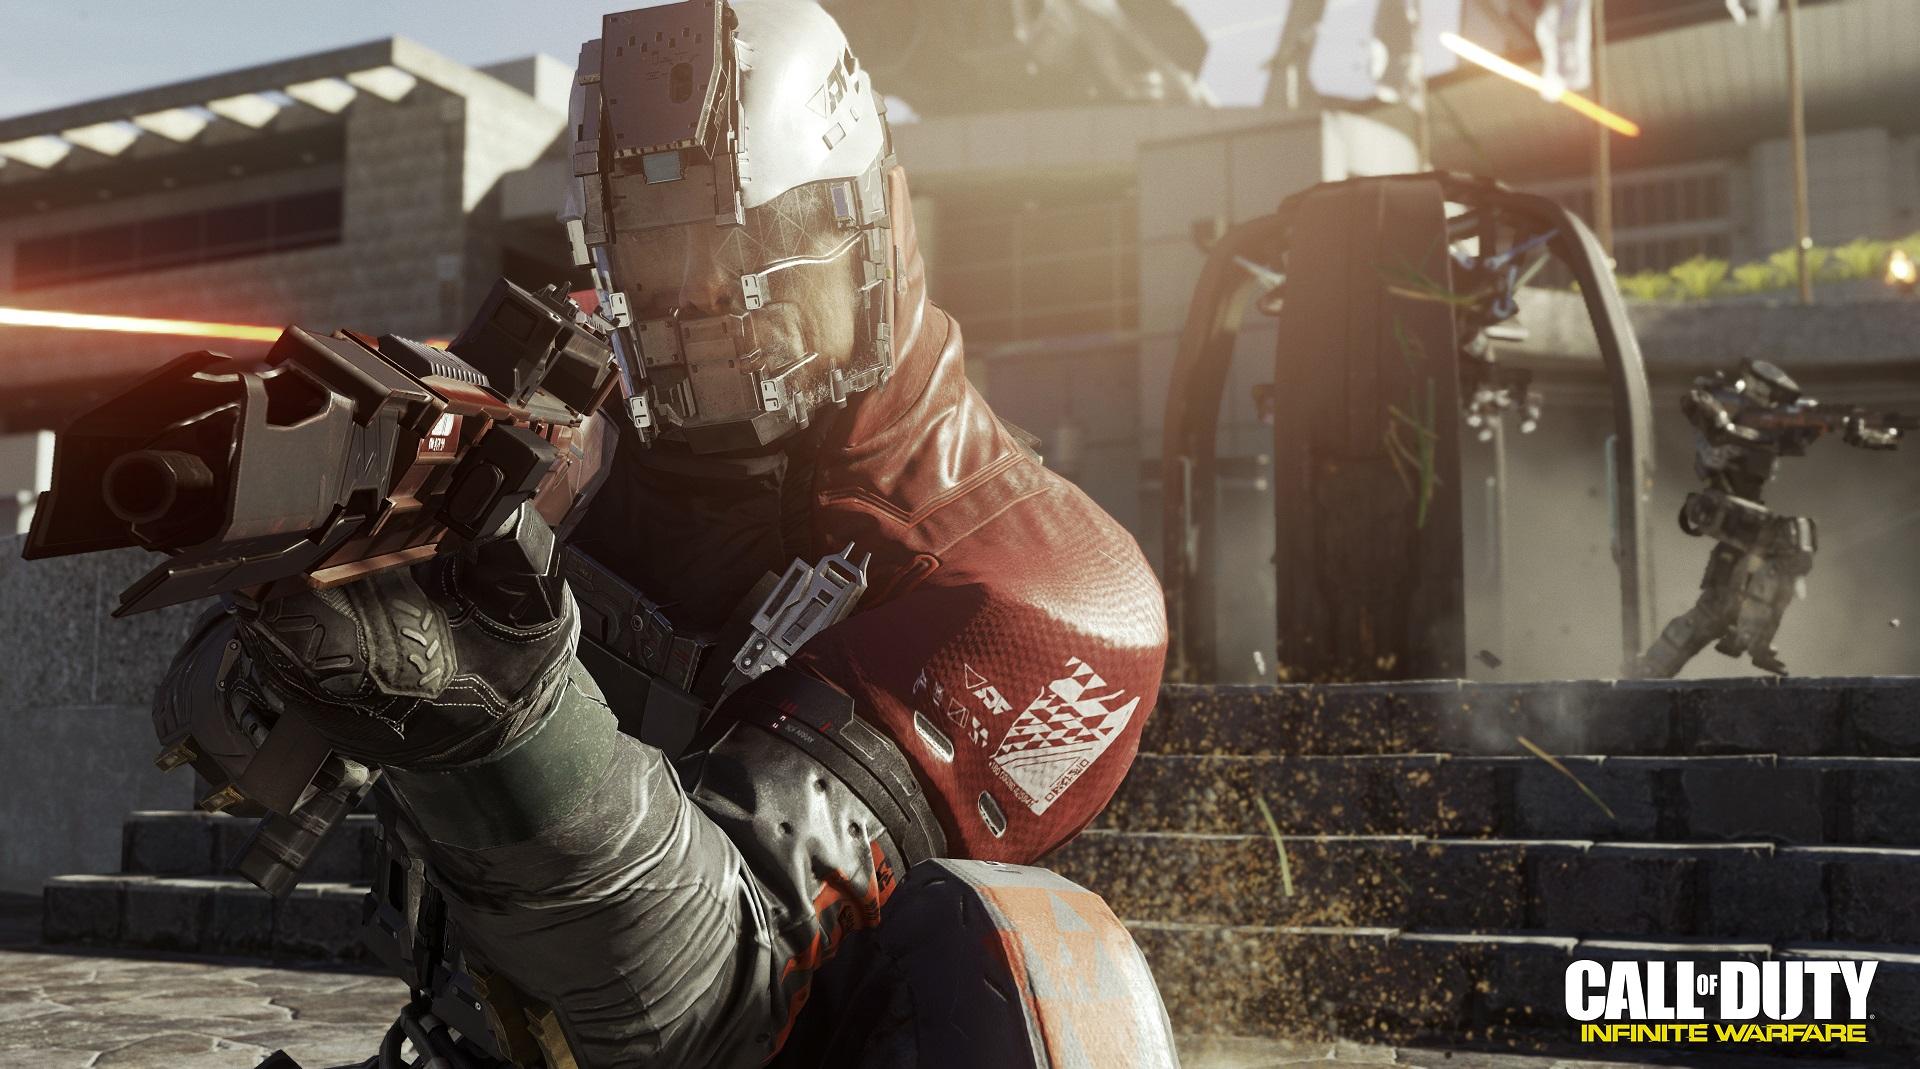 Flerspillerbetaen for Infinite Warfare sparkes straks i gang.